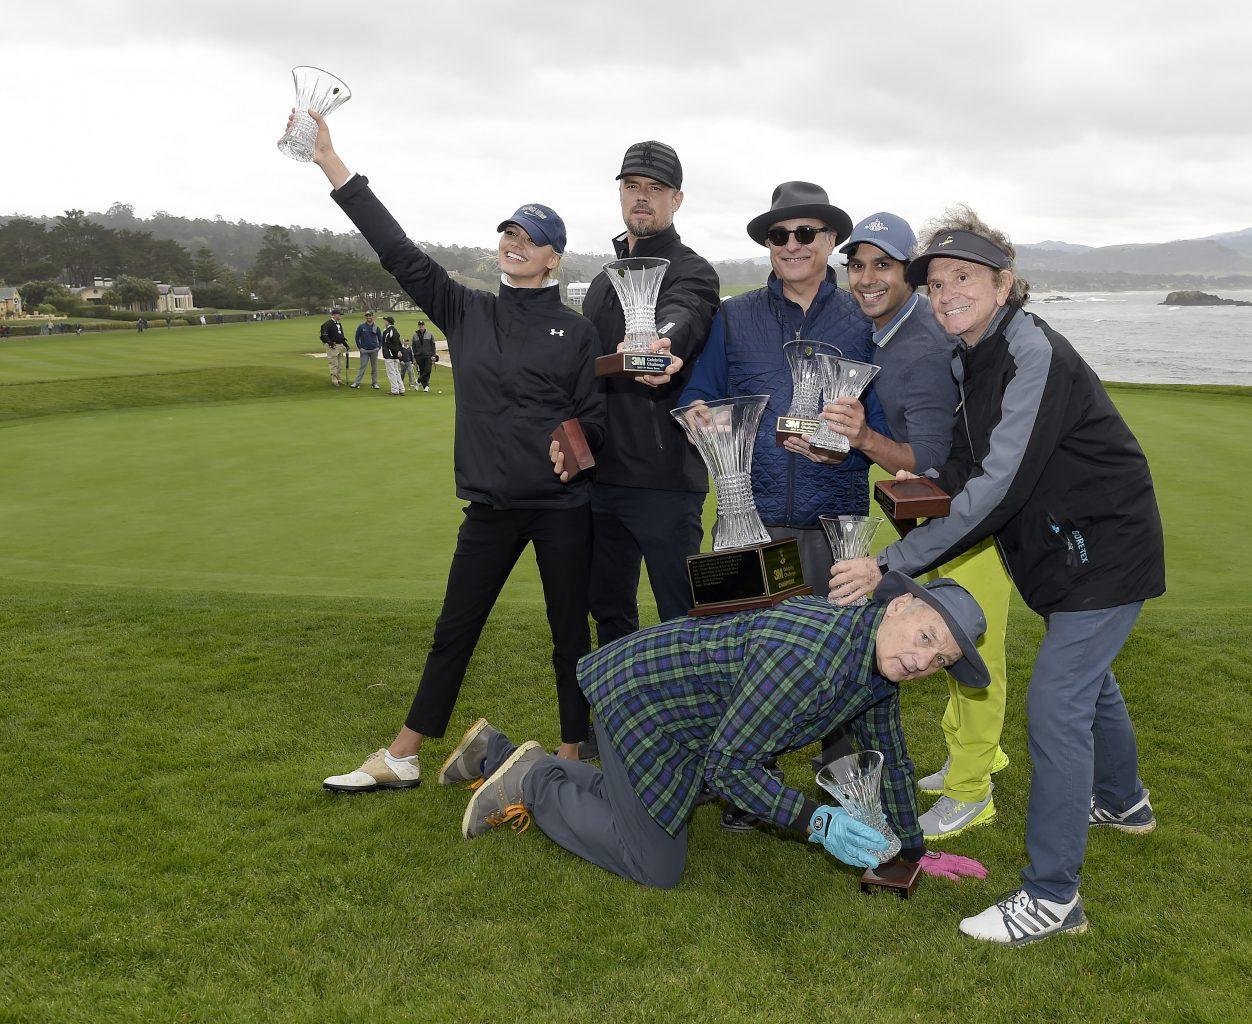 Team Murray - 3M Celebrity Challenge